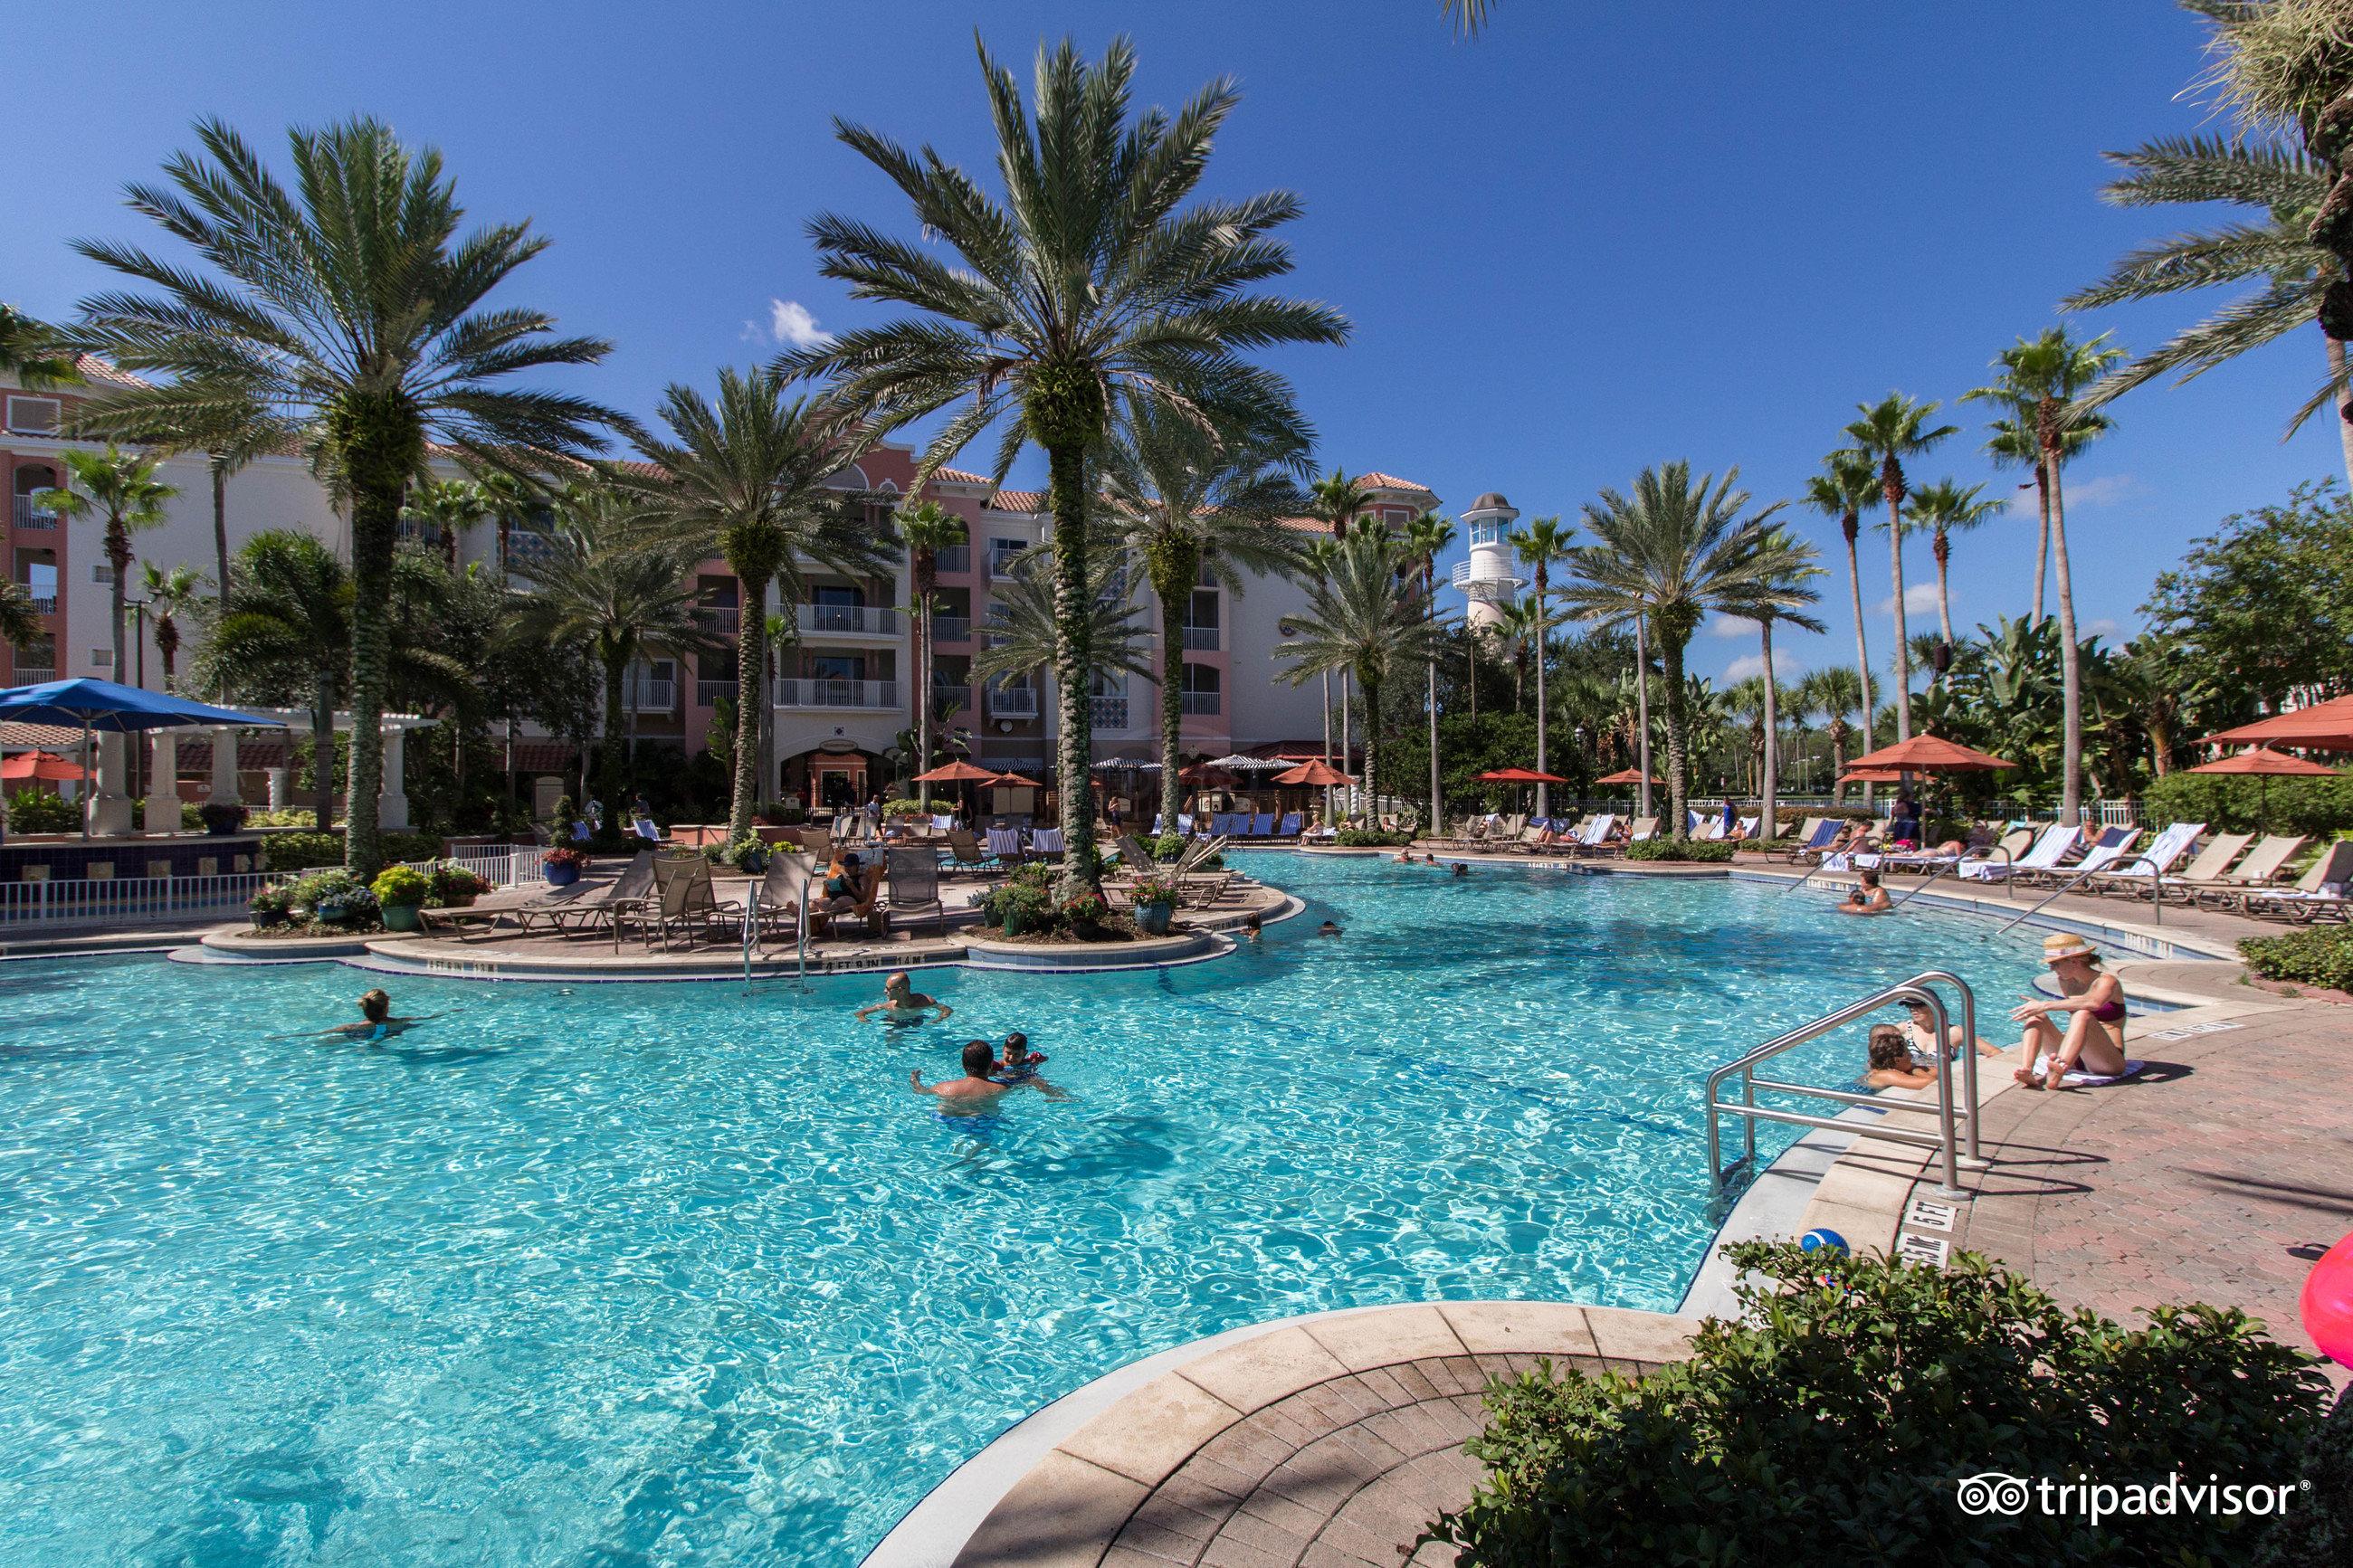 Marriott s Grande Vista Orlando FL 2018 Hotel Review & Ratings